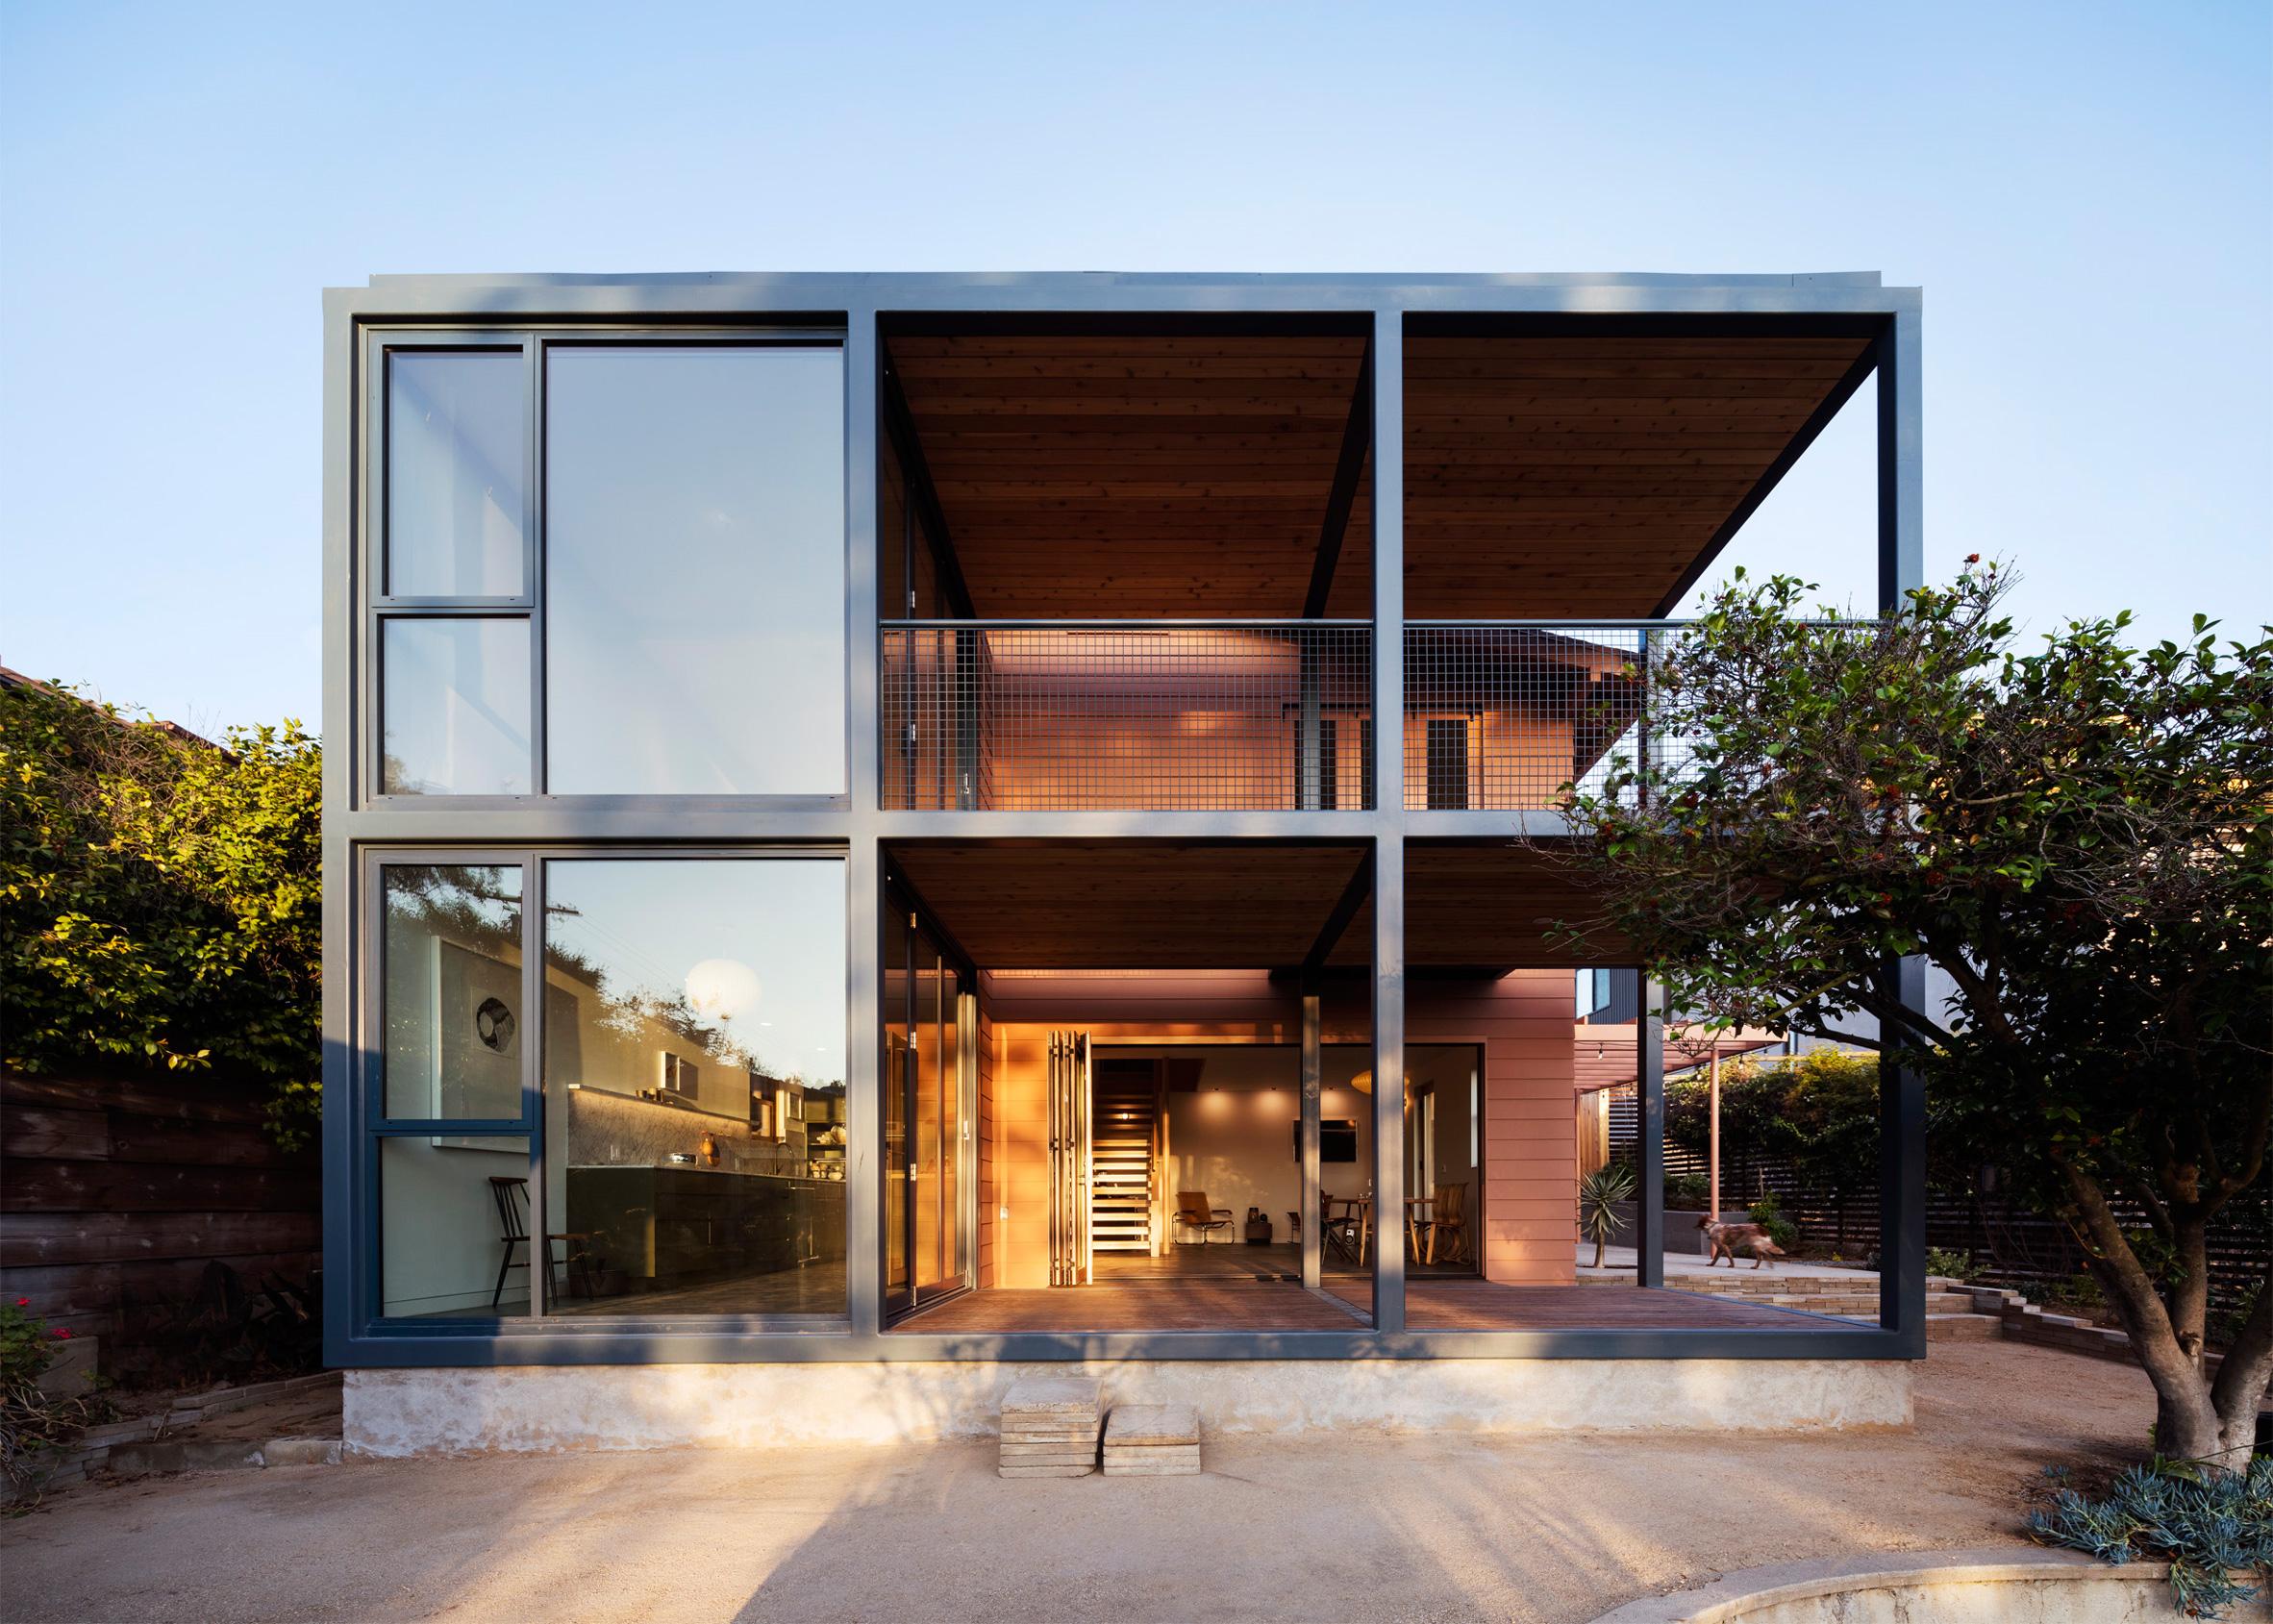 Fleischmann House, California, by Productora